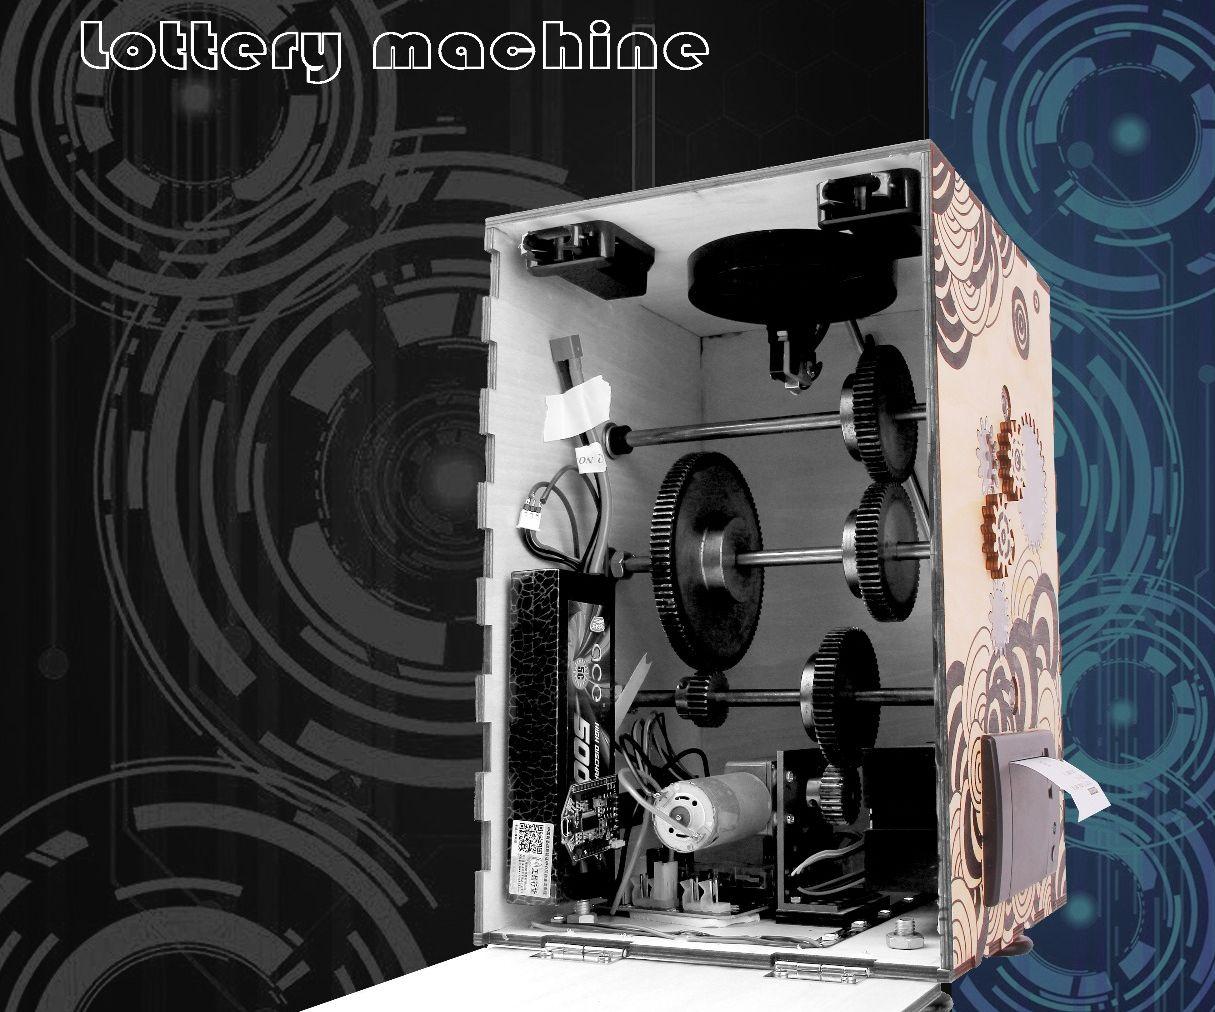 A steam punk style lottery machine